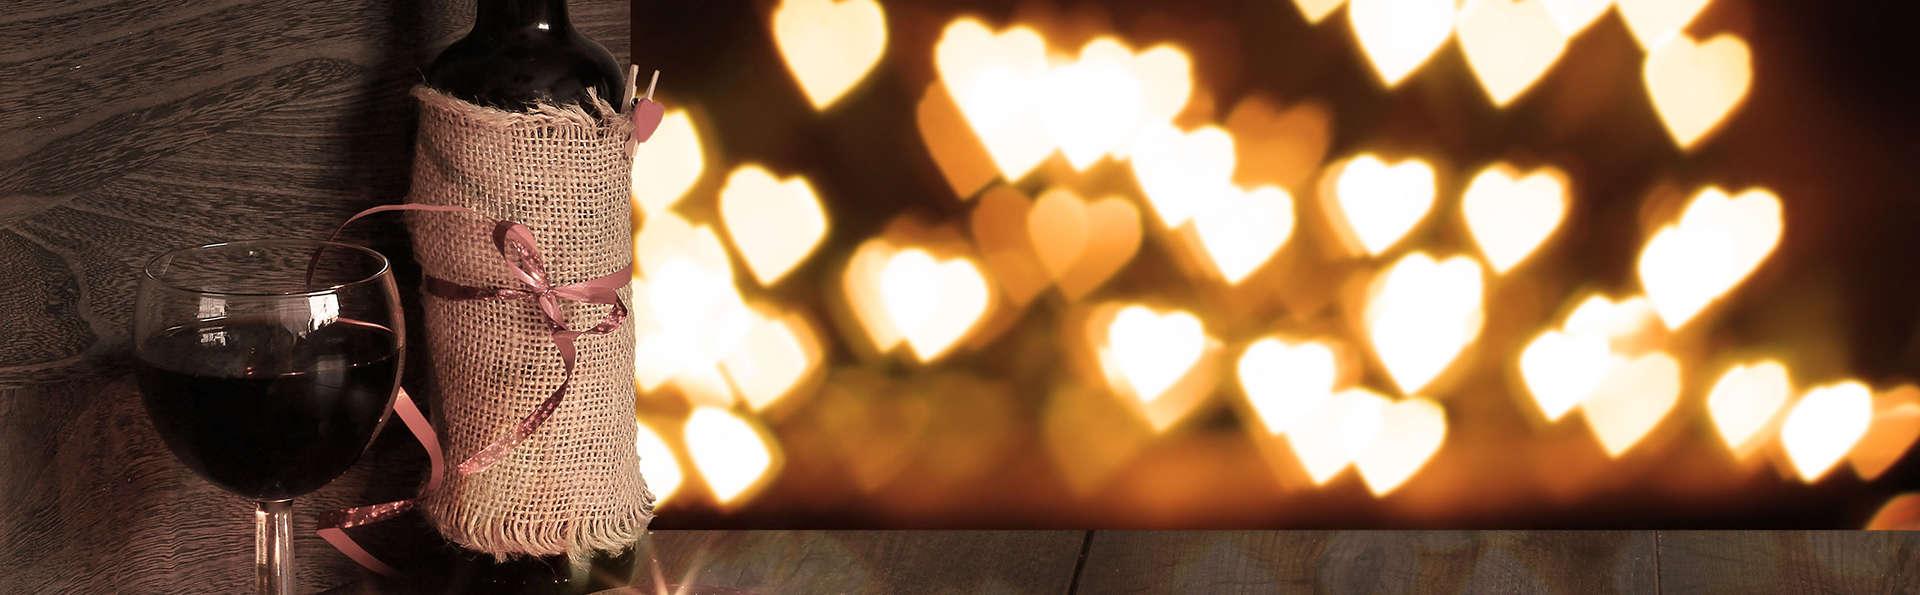 Saint Valentin gourmande à Clermont-Ferrand